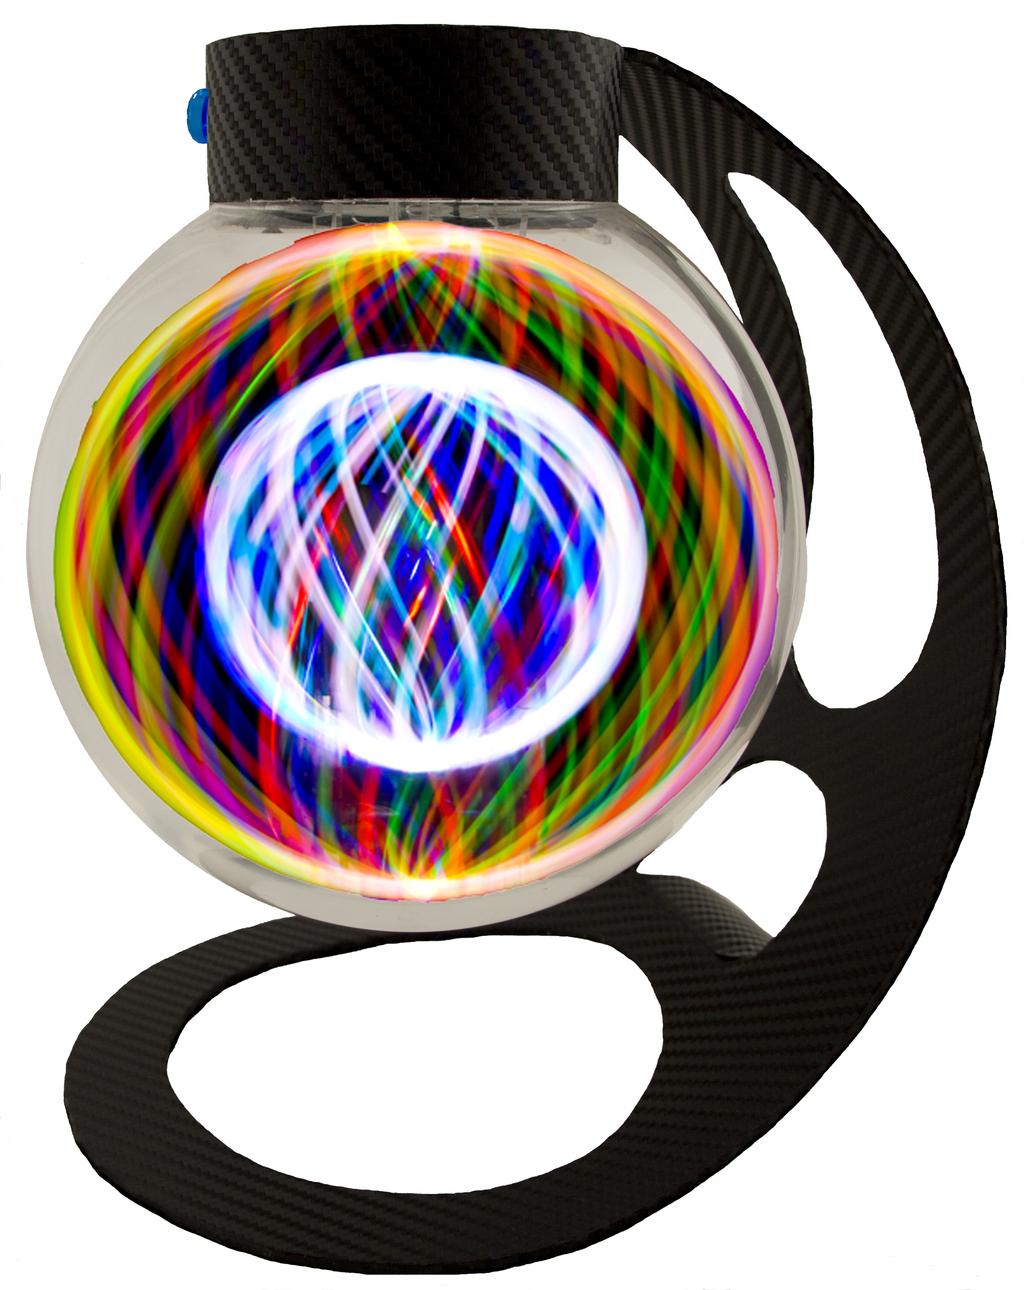 LEDMorpher